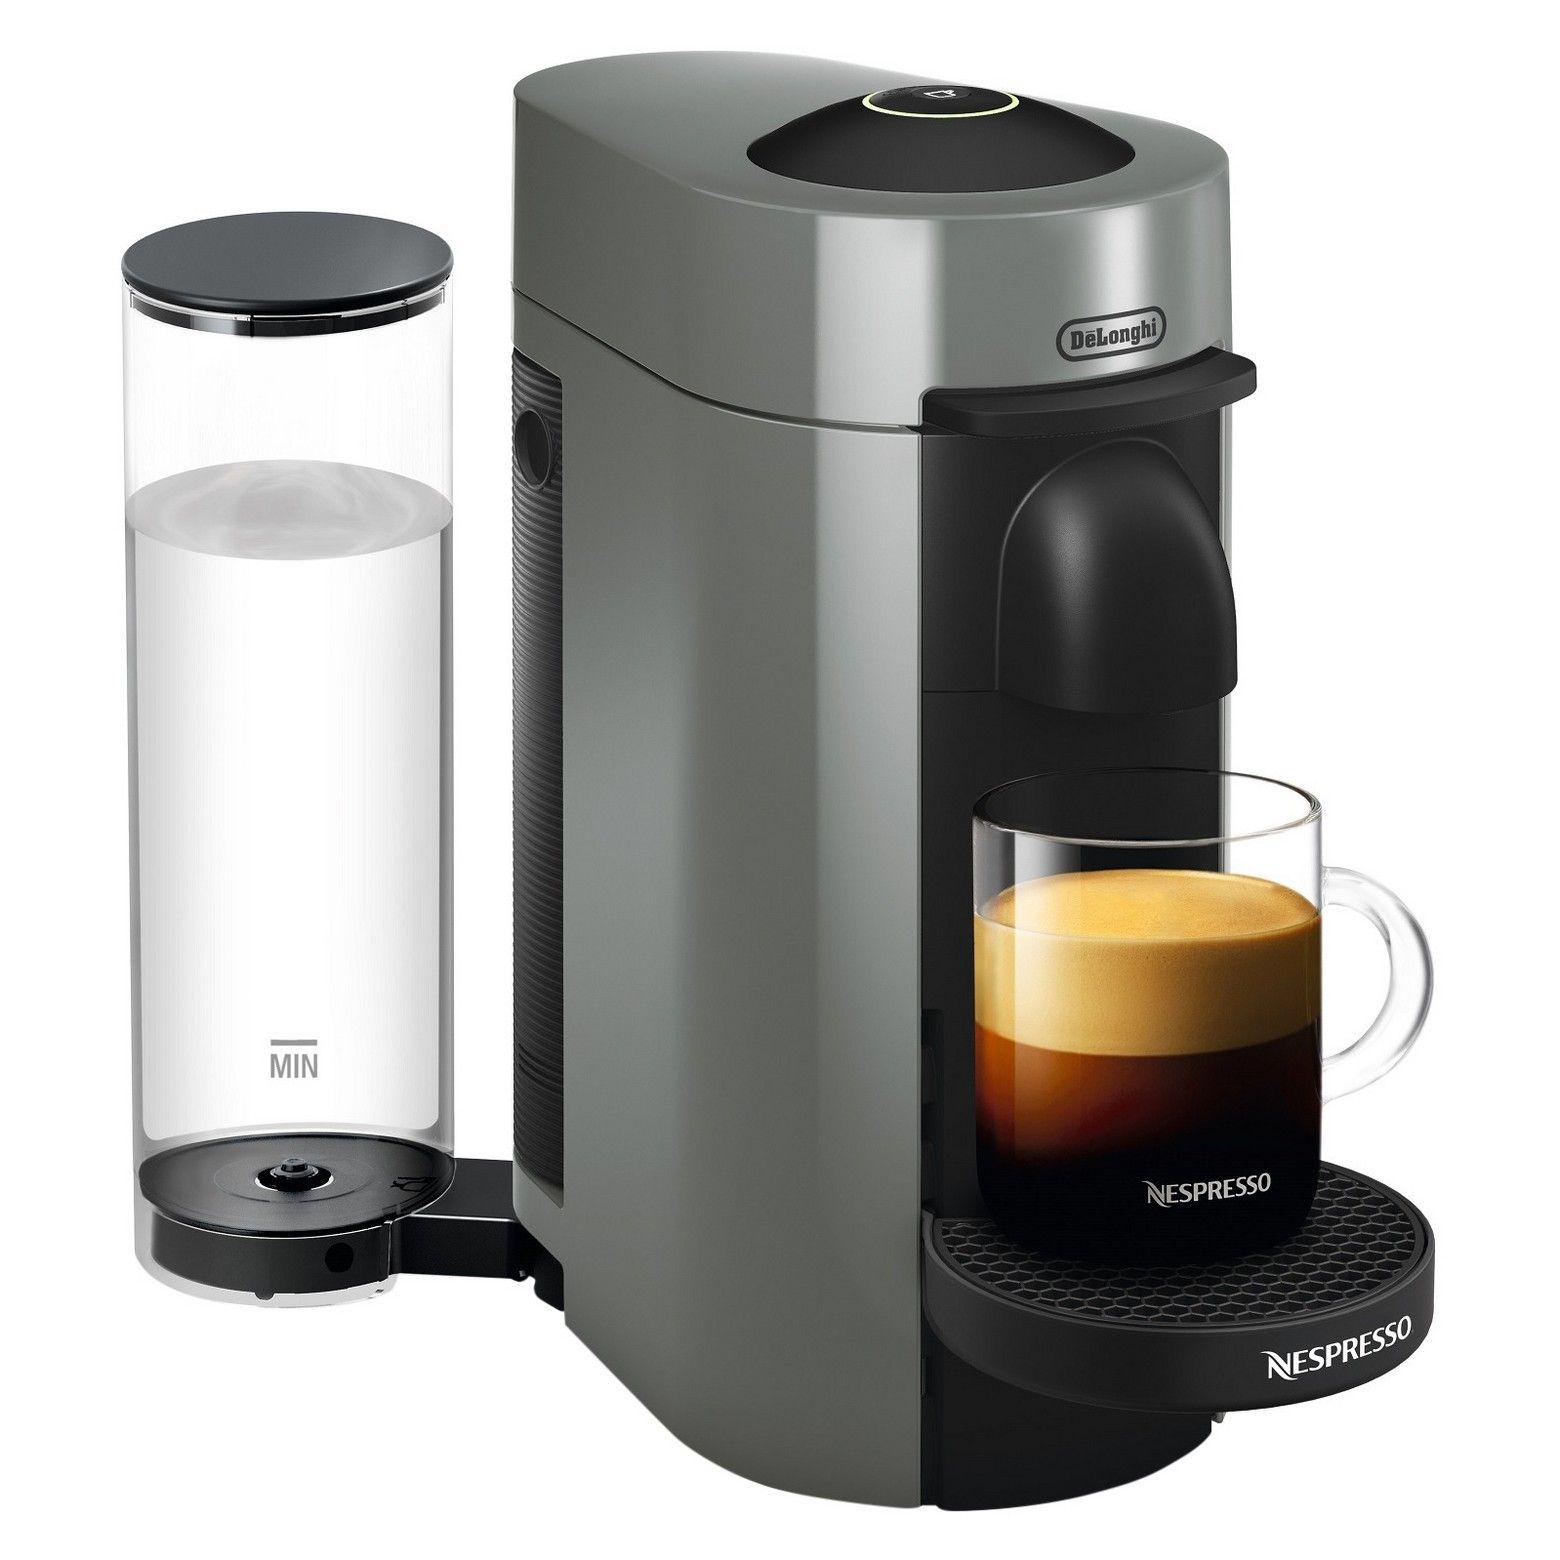 Nespresso VertuoPlus Coffee and Espresso Machine by De